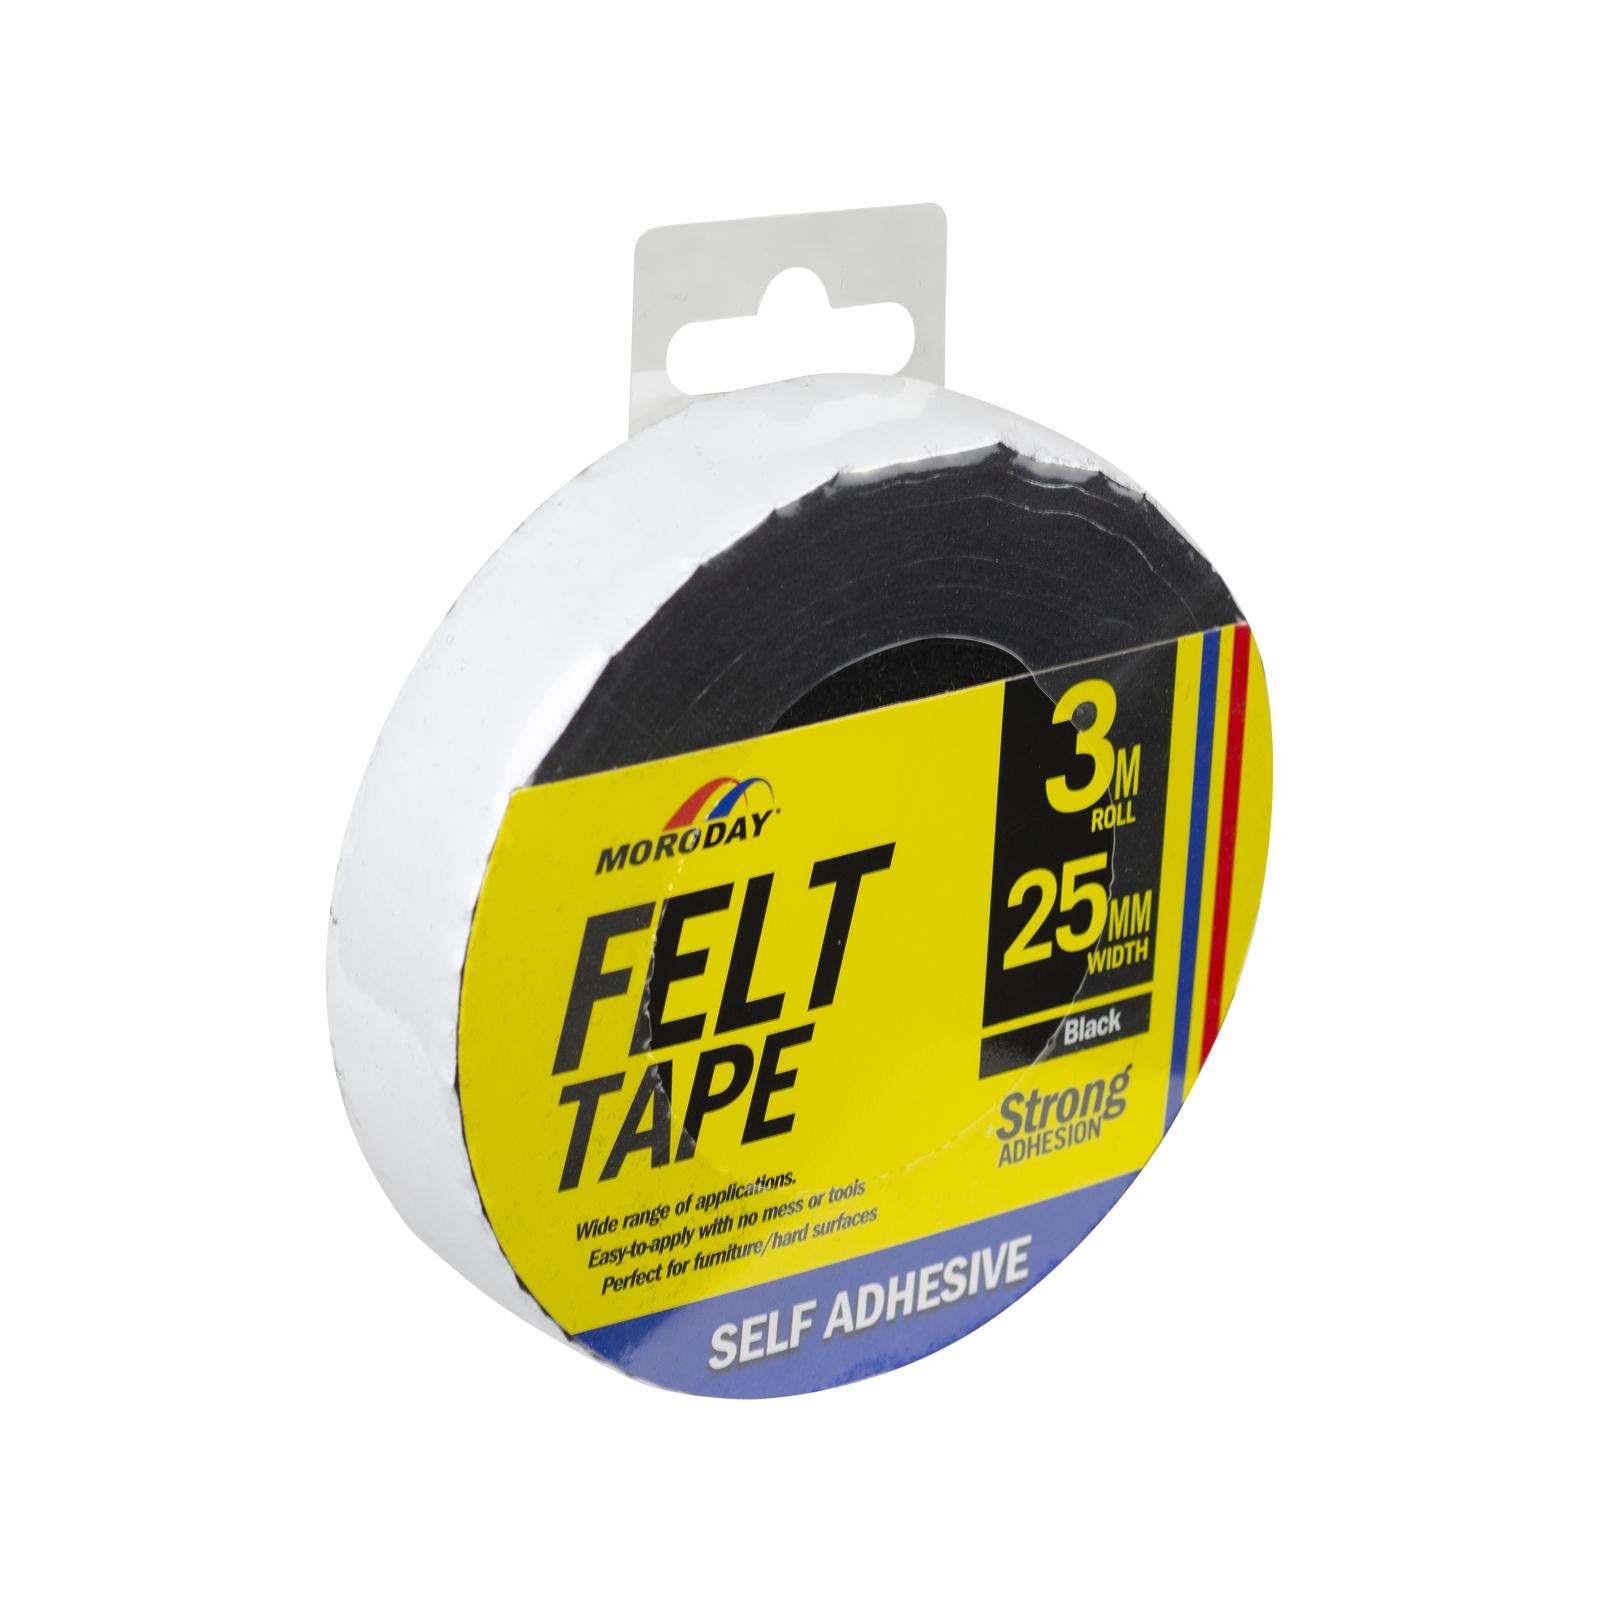 Moroday 25mm x 3m Felt Scratch Saver Self Adhesive Tape